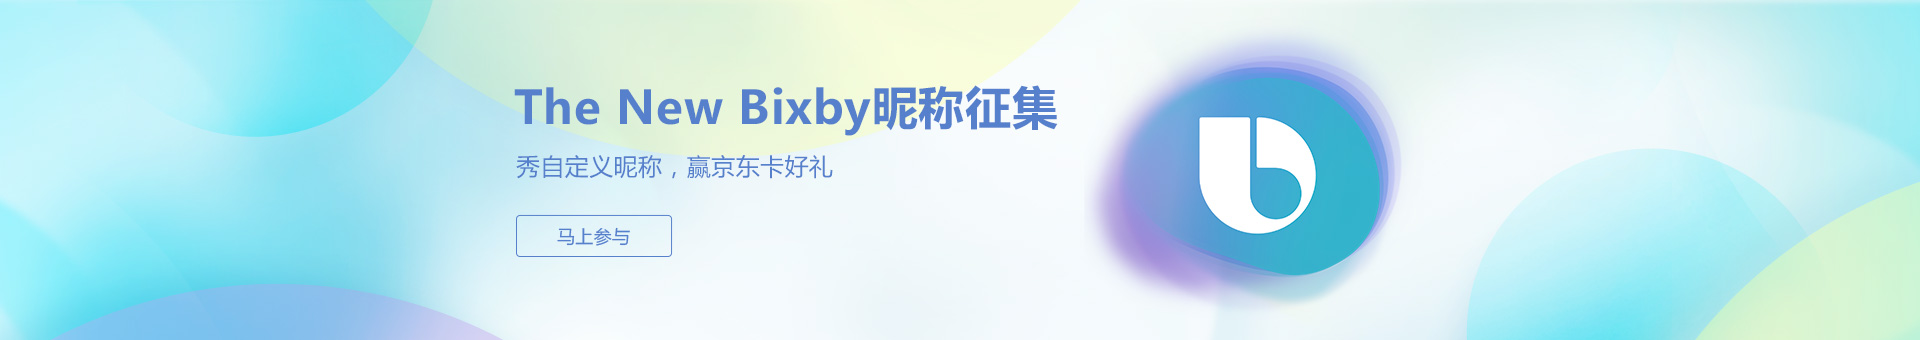 The New Bixby自定义昵称有奖征集活动